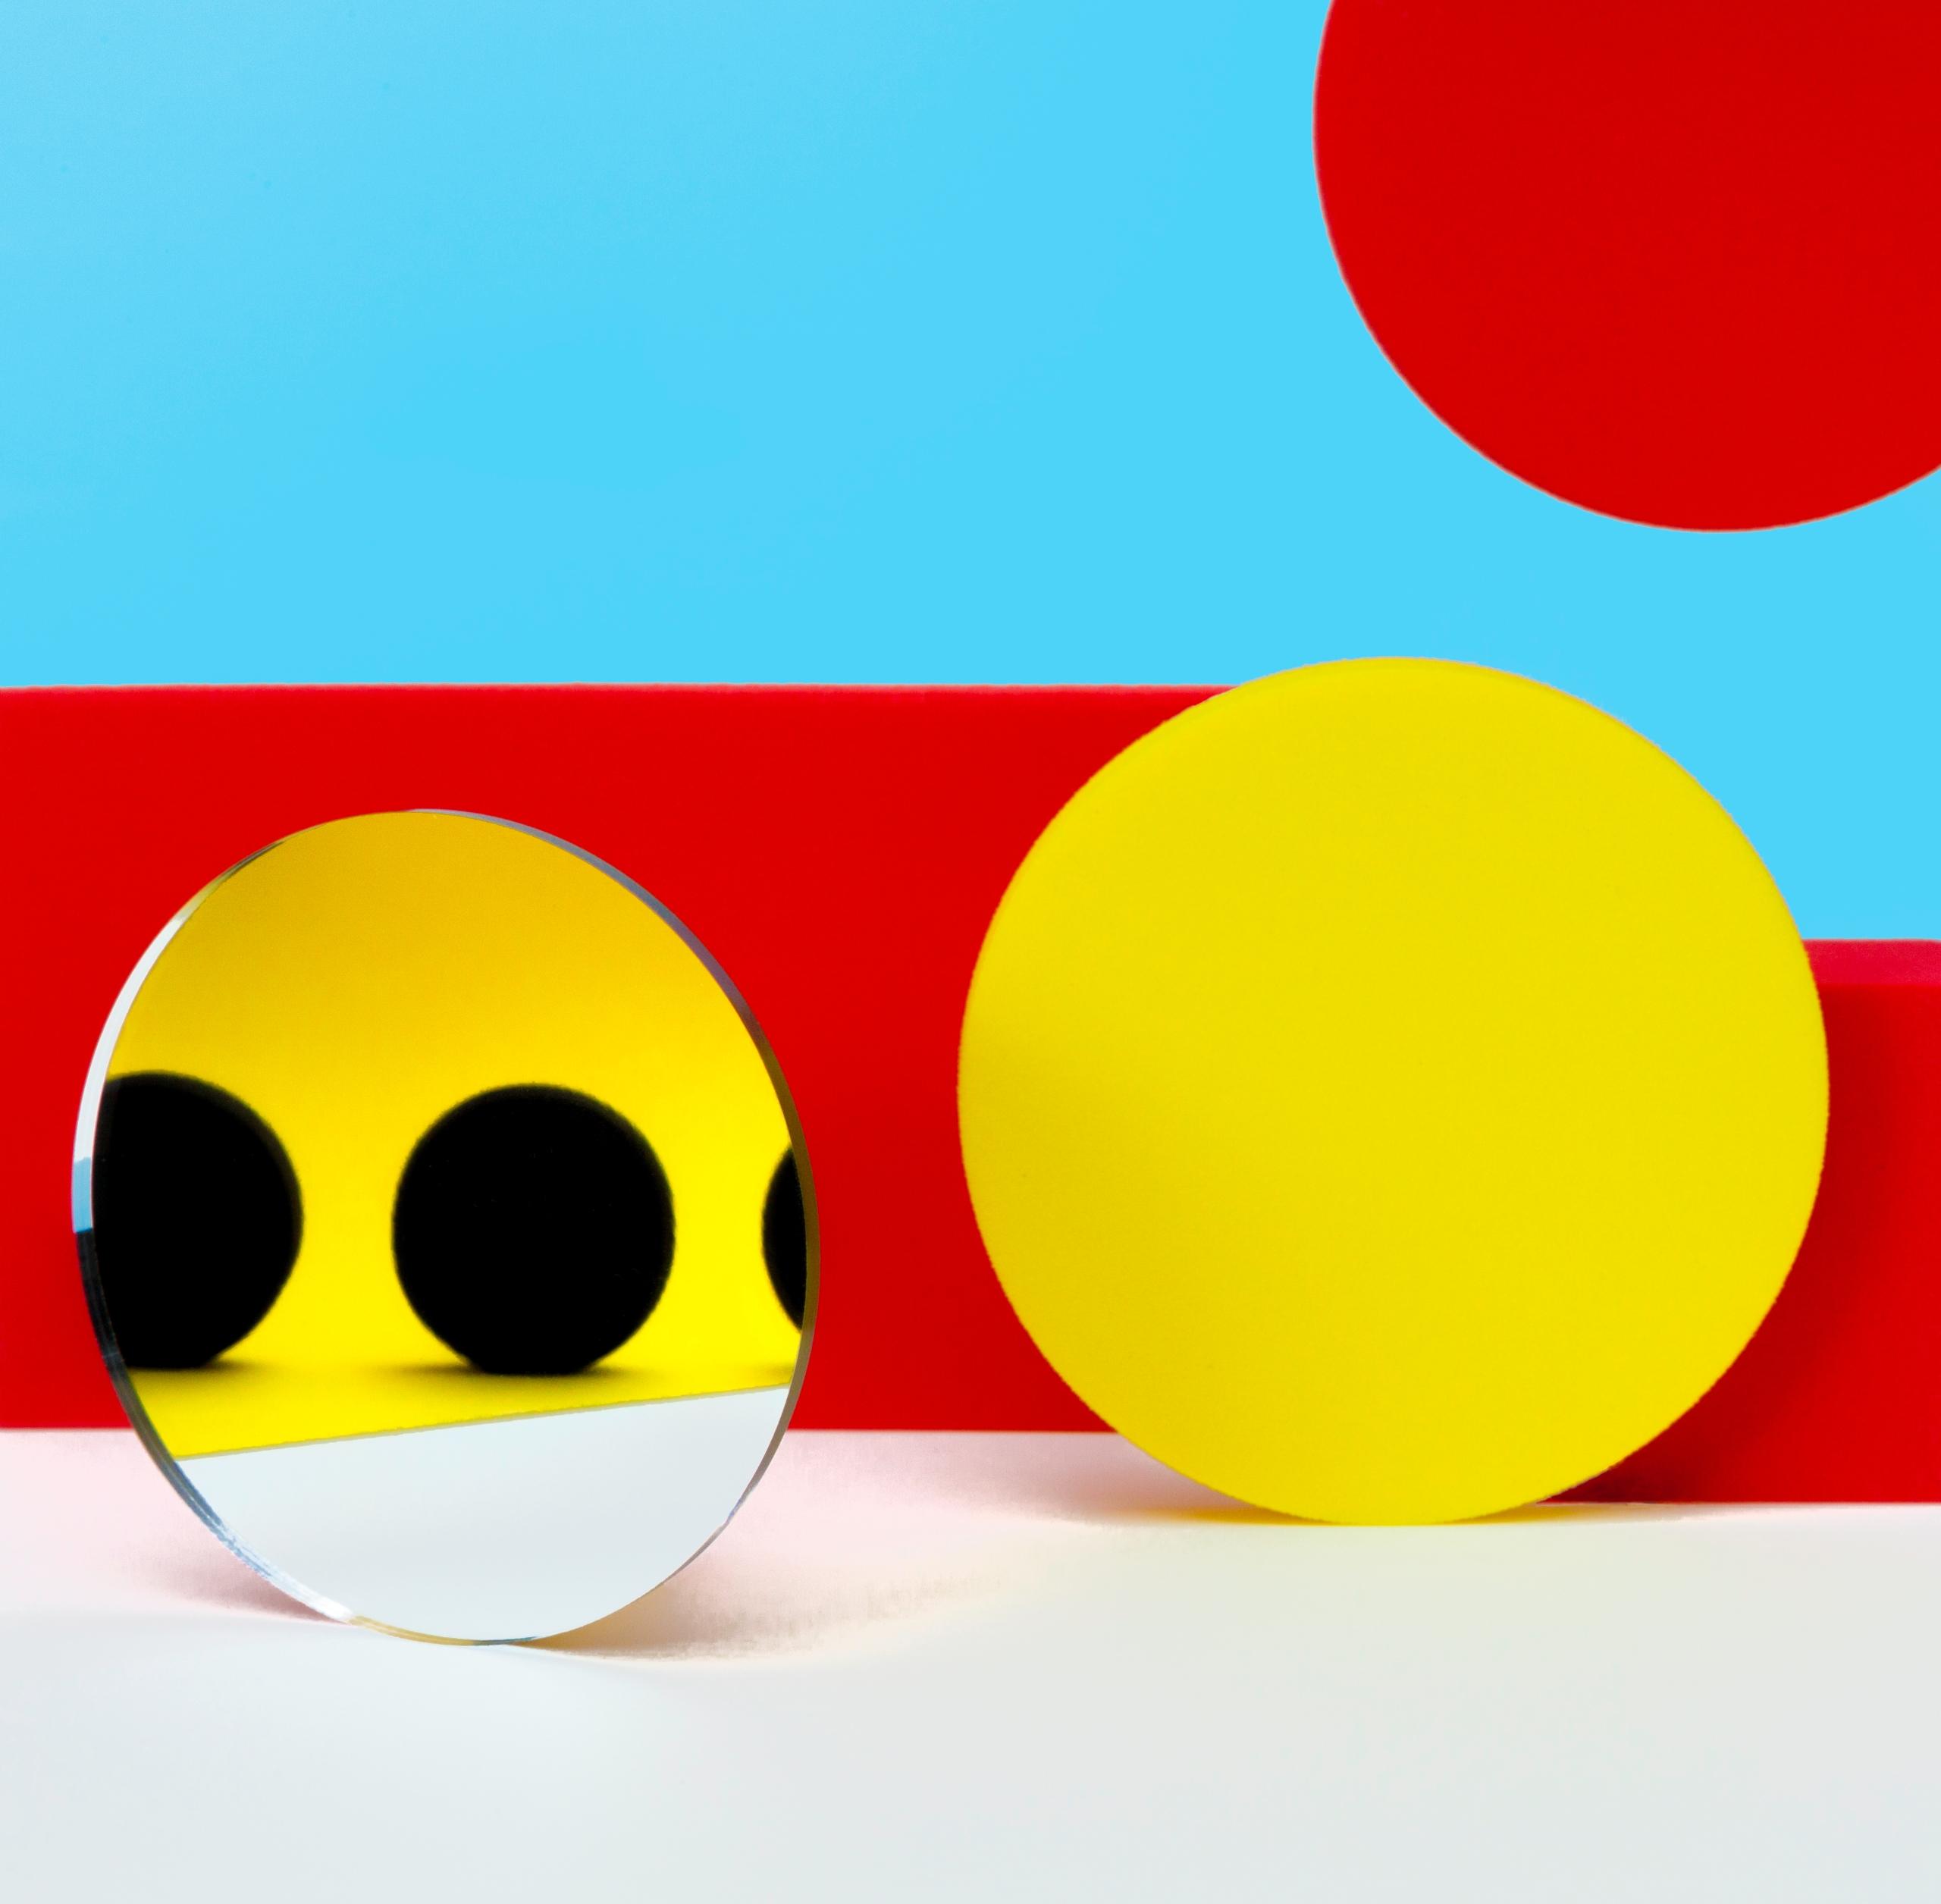 Playtime - shapes, colour, play - jonathanpound   ello